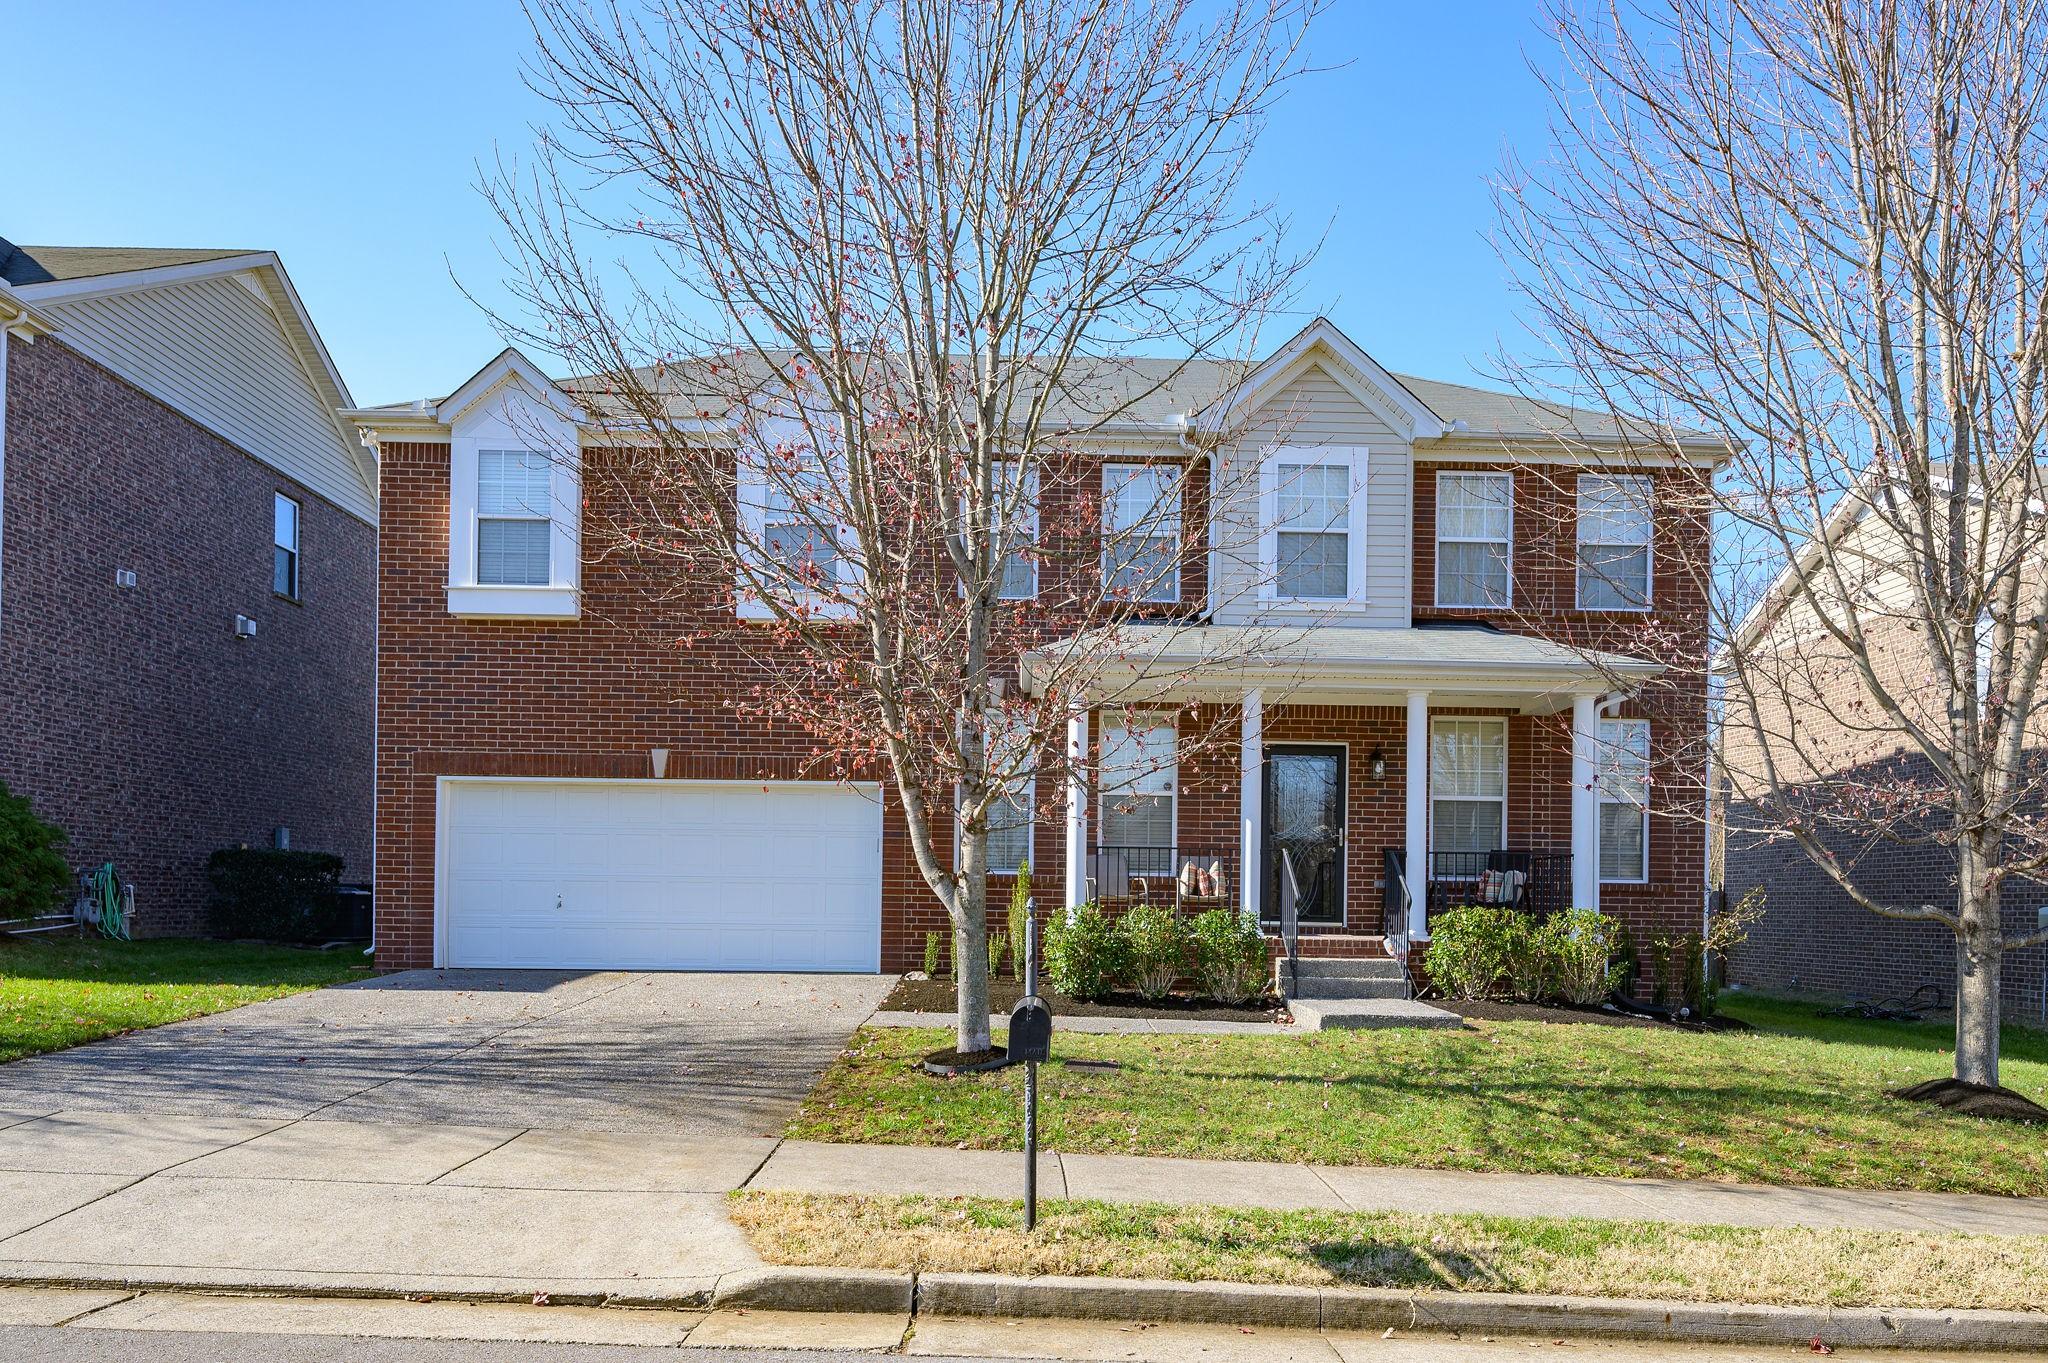 3116 Barnes Bend Dr, Antioch, TN 37013 - Antioch, TN real estate listing